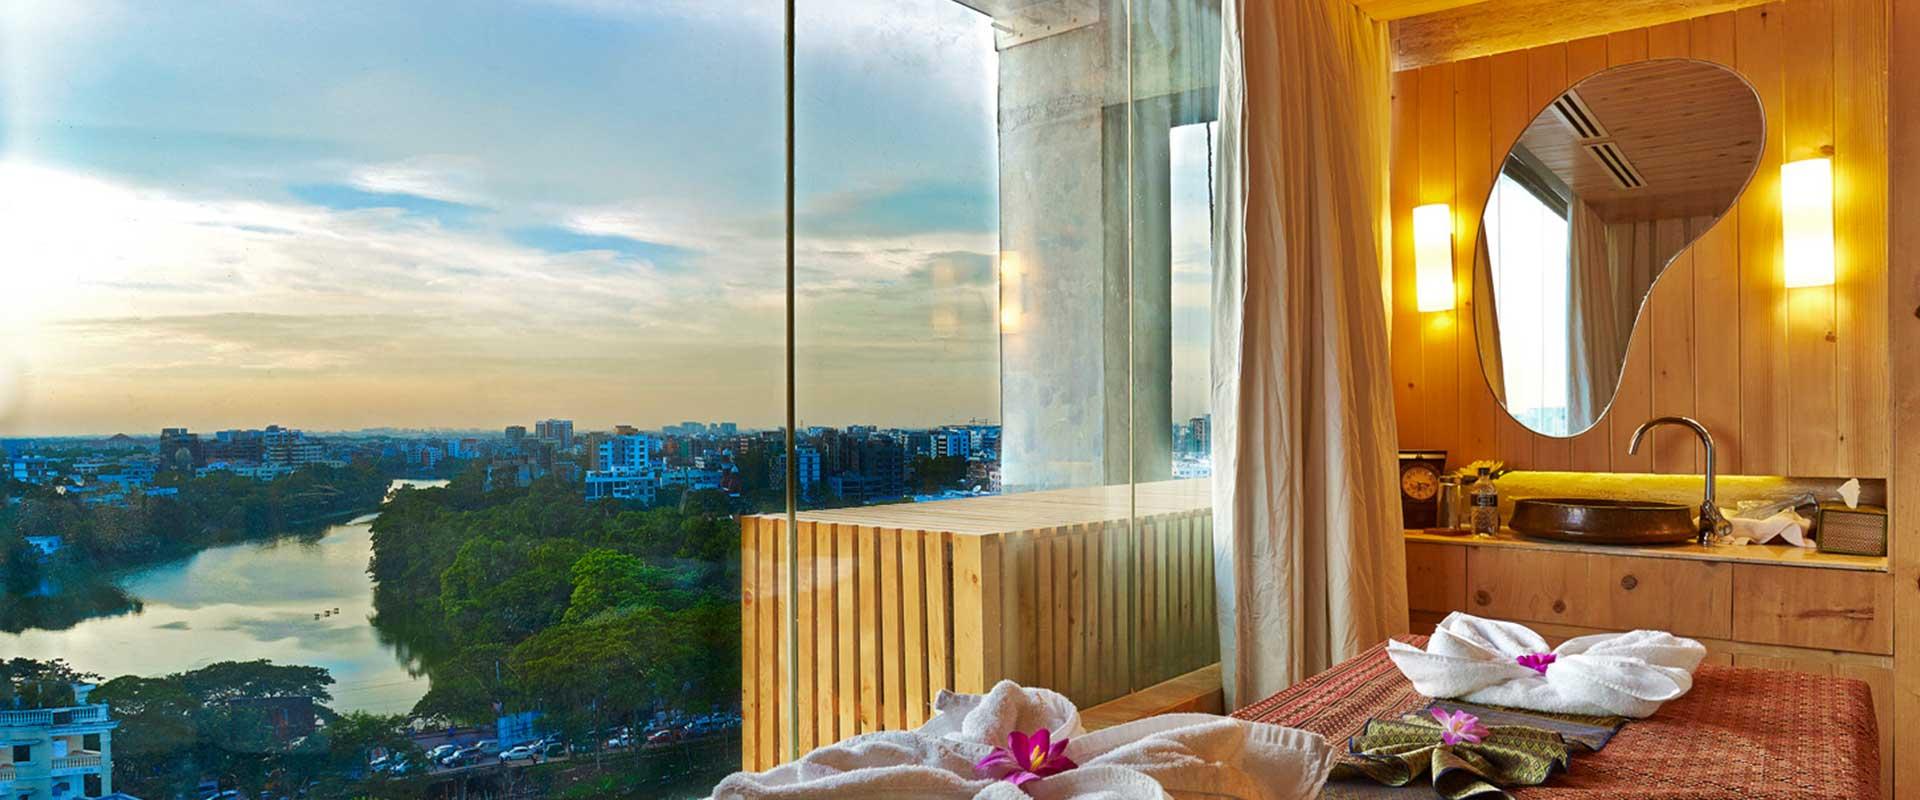 sixseasonshotel-spa